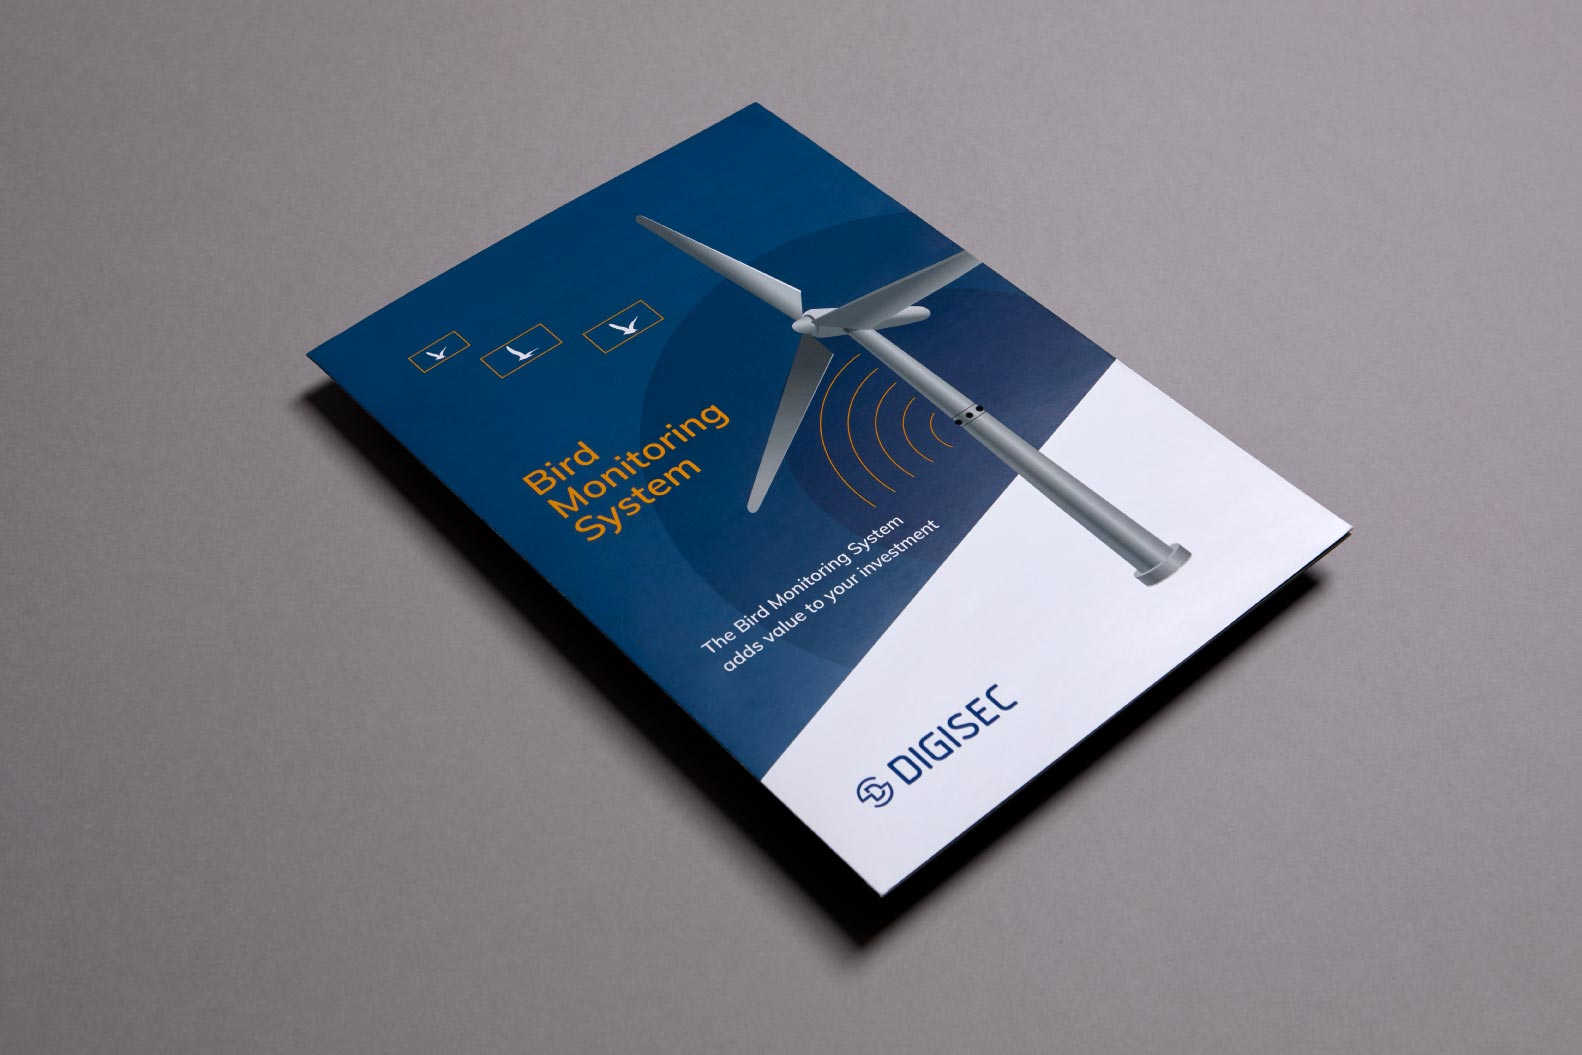 Mdesigners-digisec-brochure-design-bird-monitoring-system-2